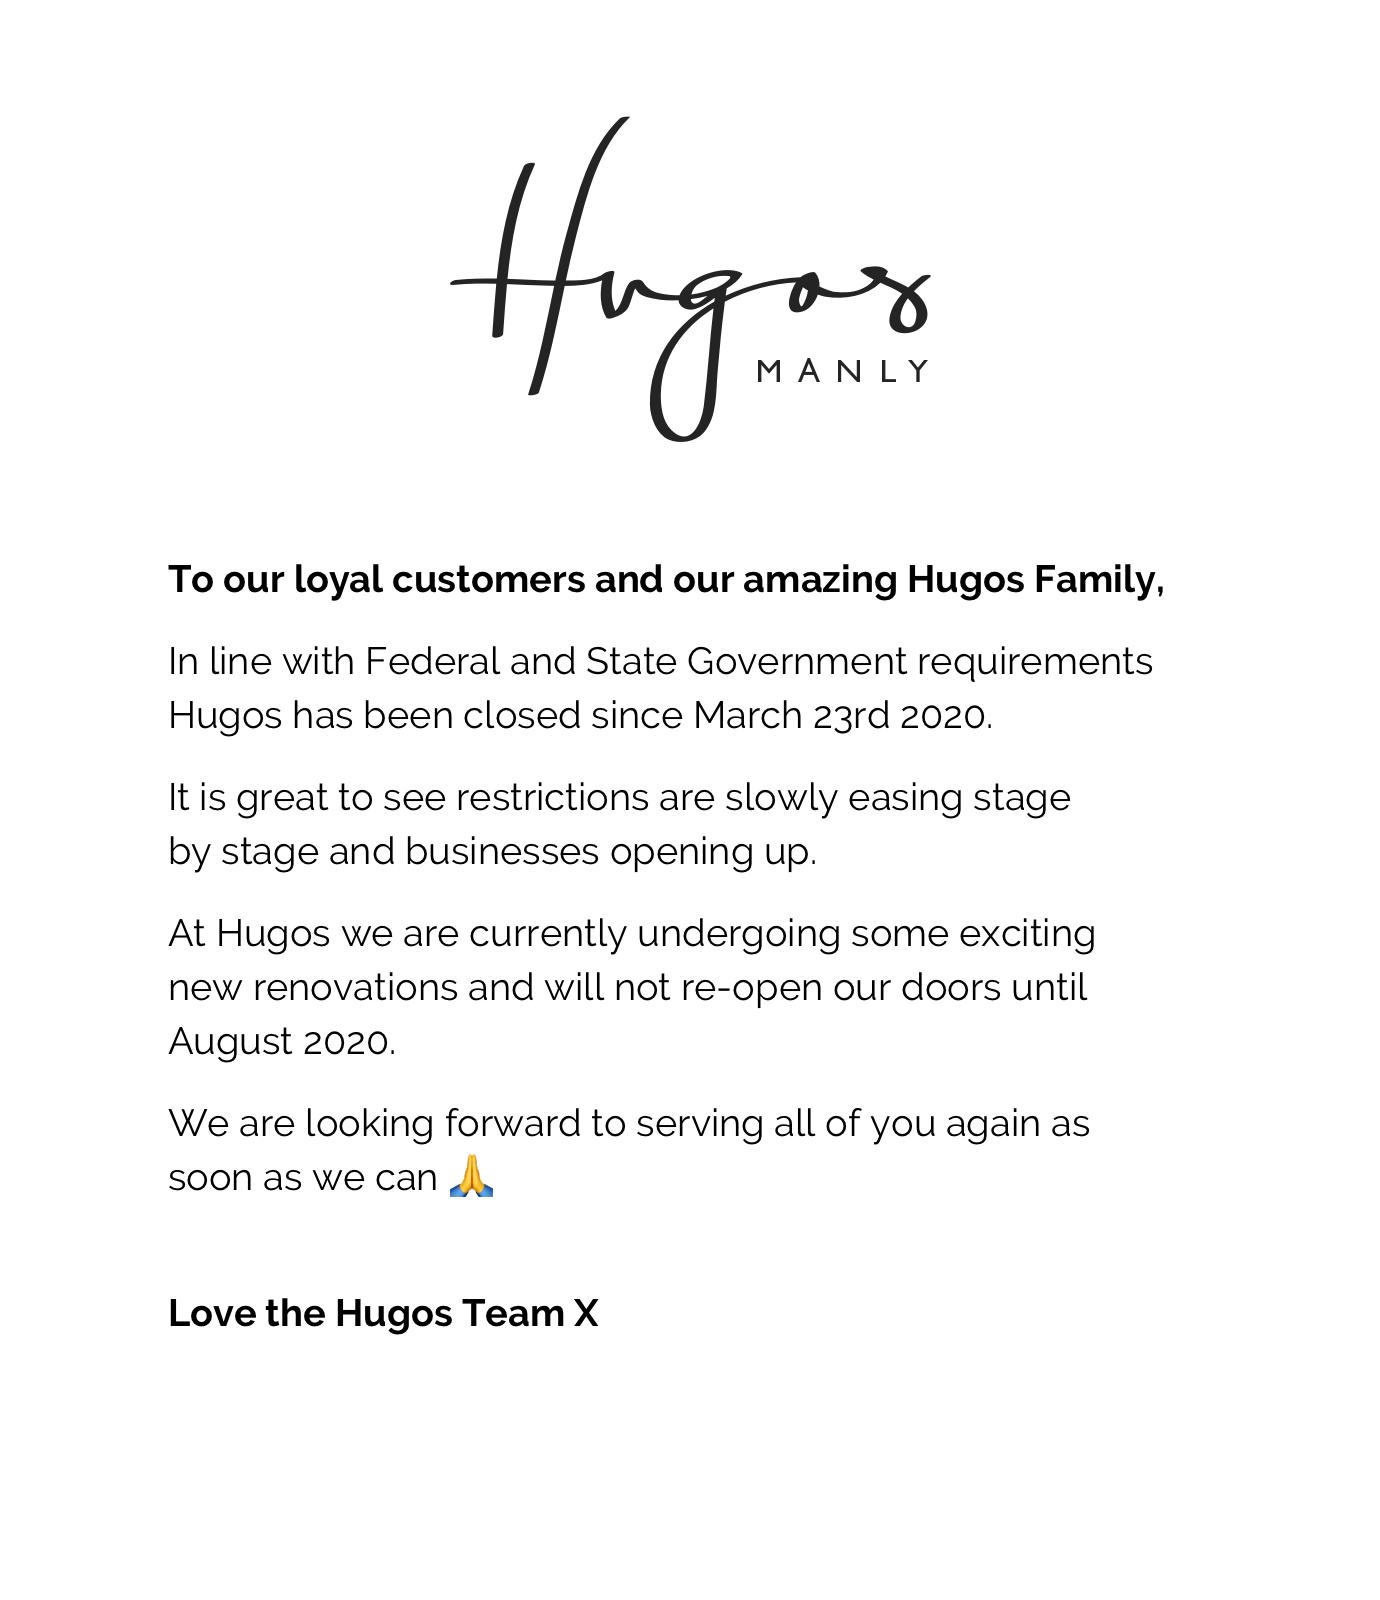 Hugos News Update